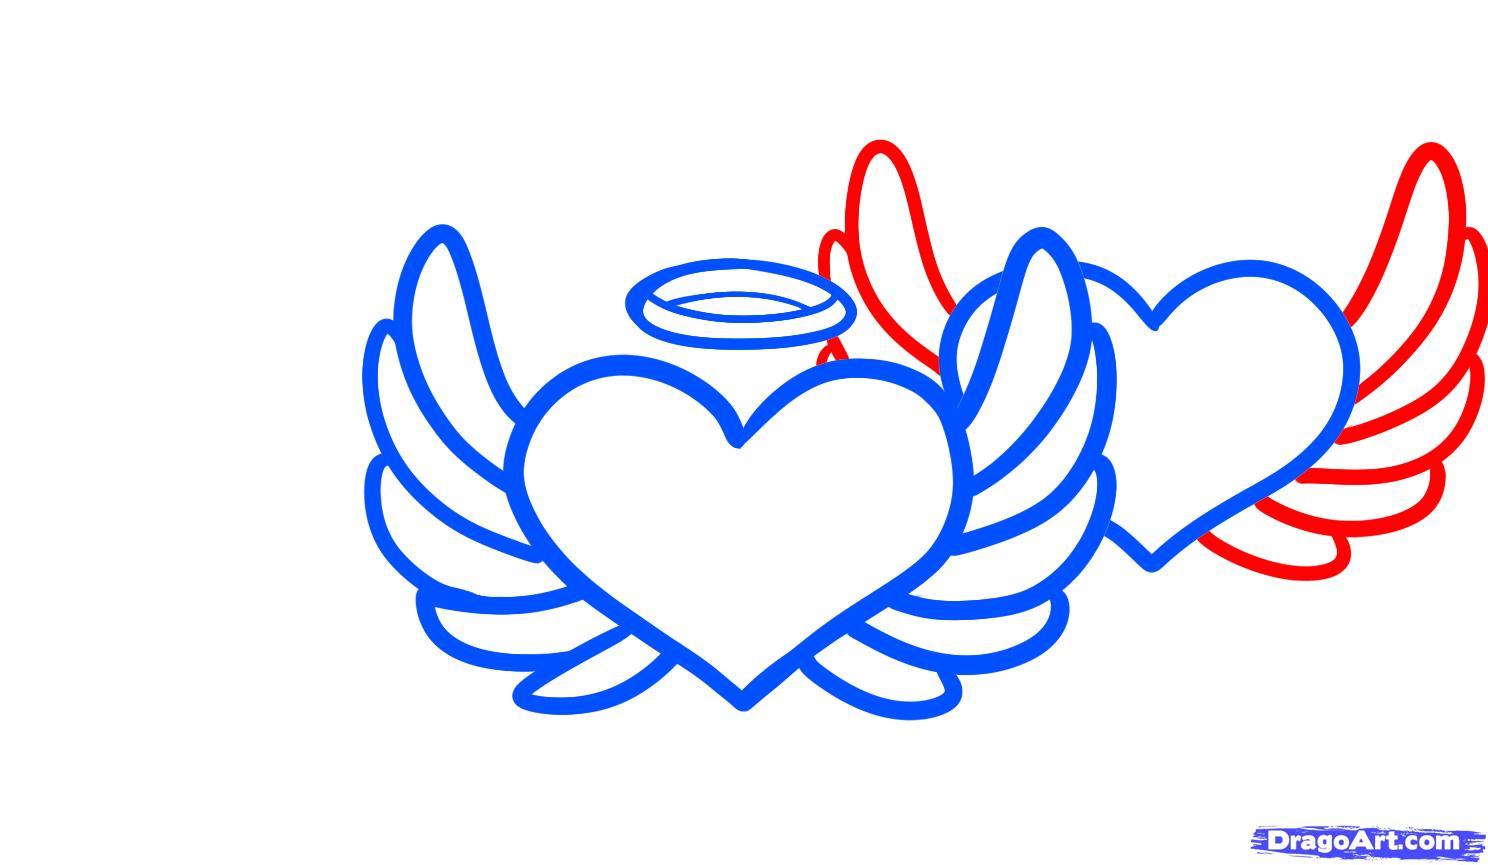 Drawn hearts angel 5  Tattoos Hearts FREE